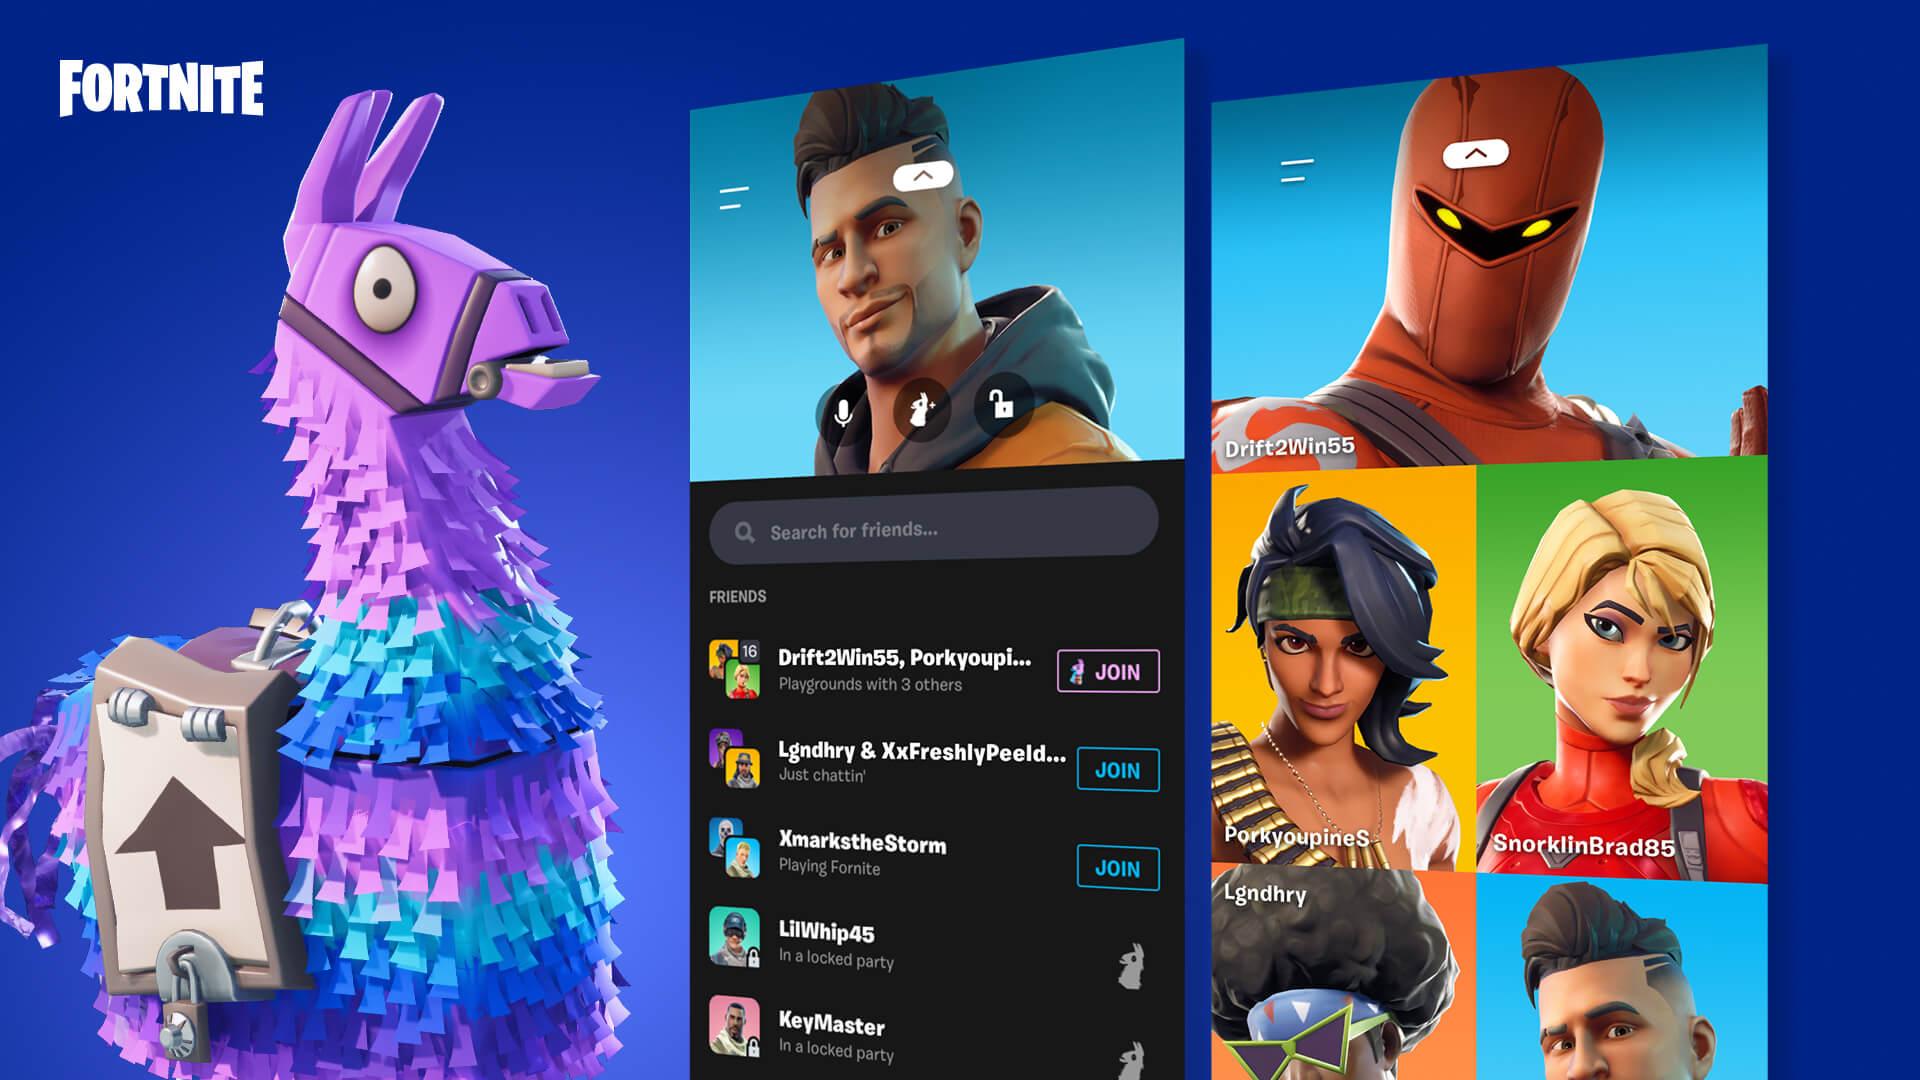 Image for Fortnite v10.31 update adds Party Hub app for mobile